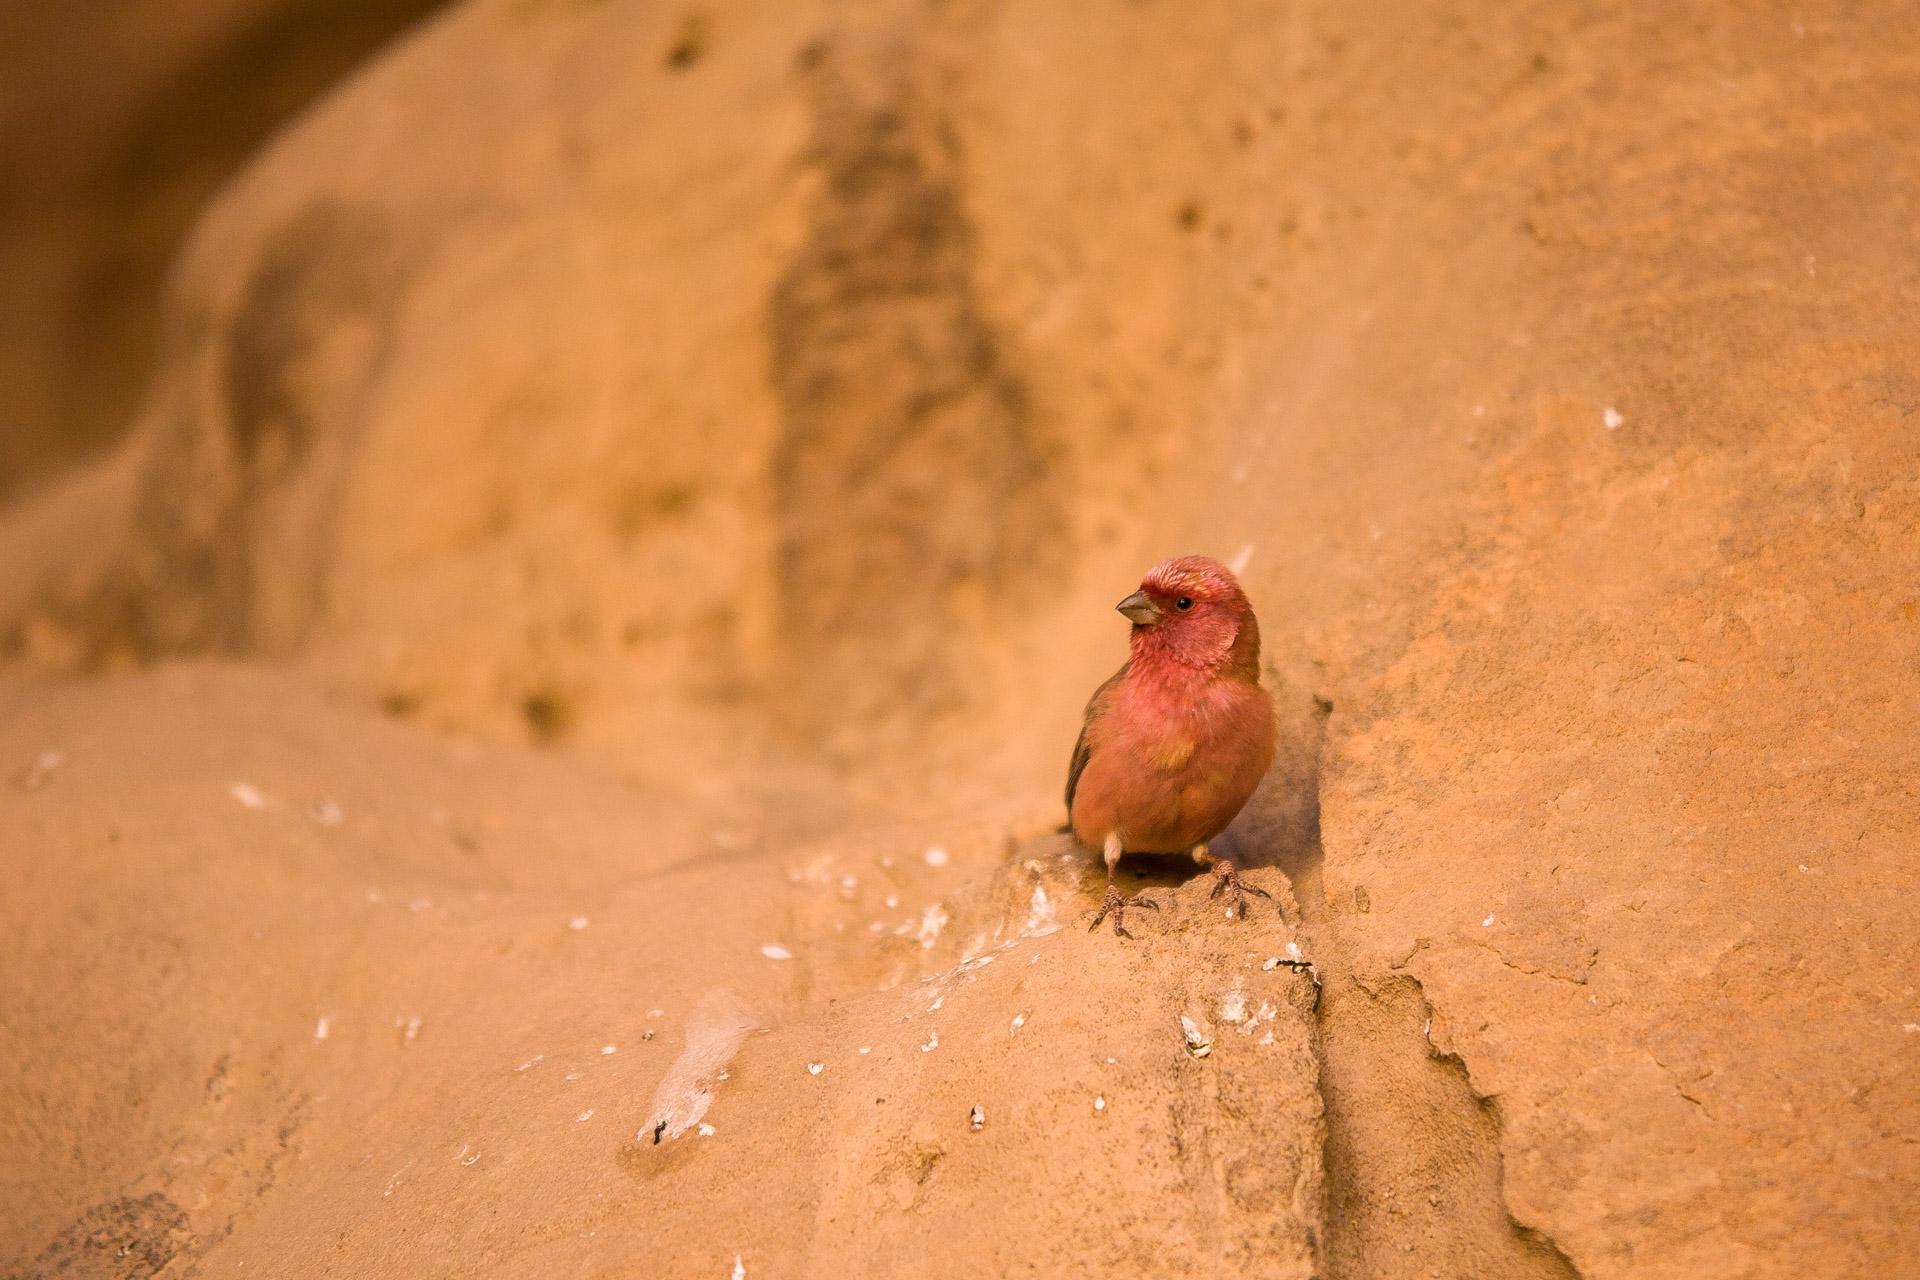 Roselin du Sinaï (Carpodacus synoicus), oiseau national du royaume hachémite de Jordanie